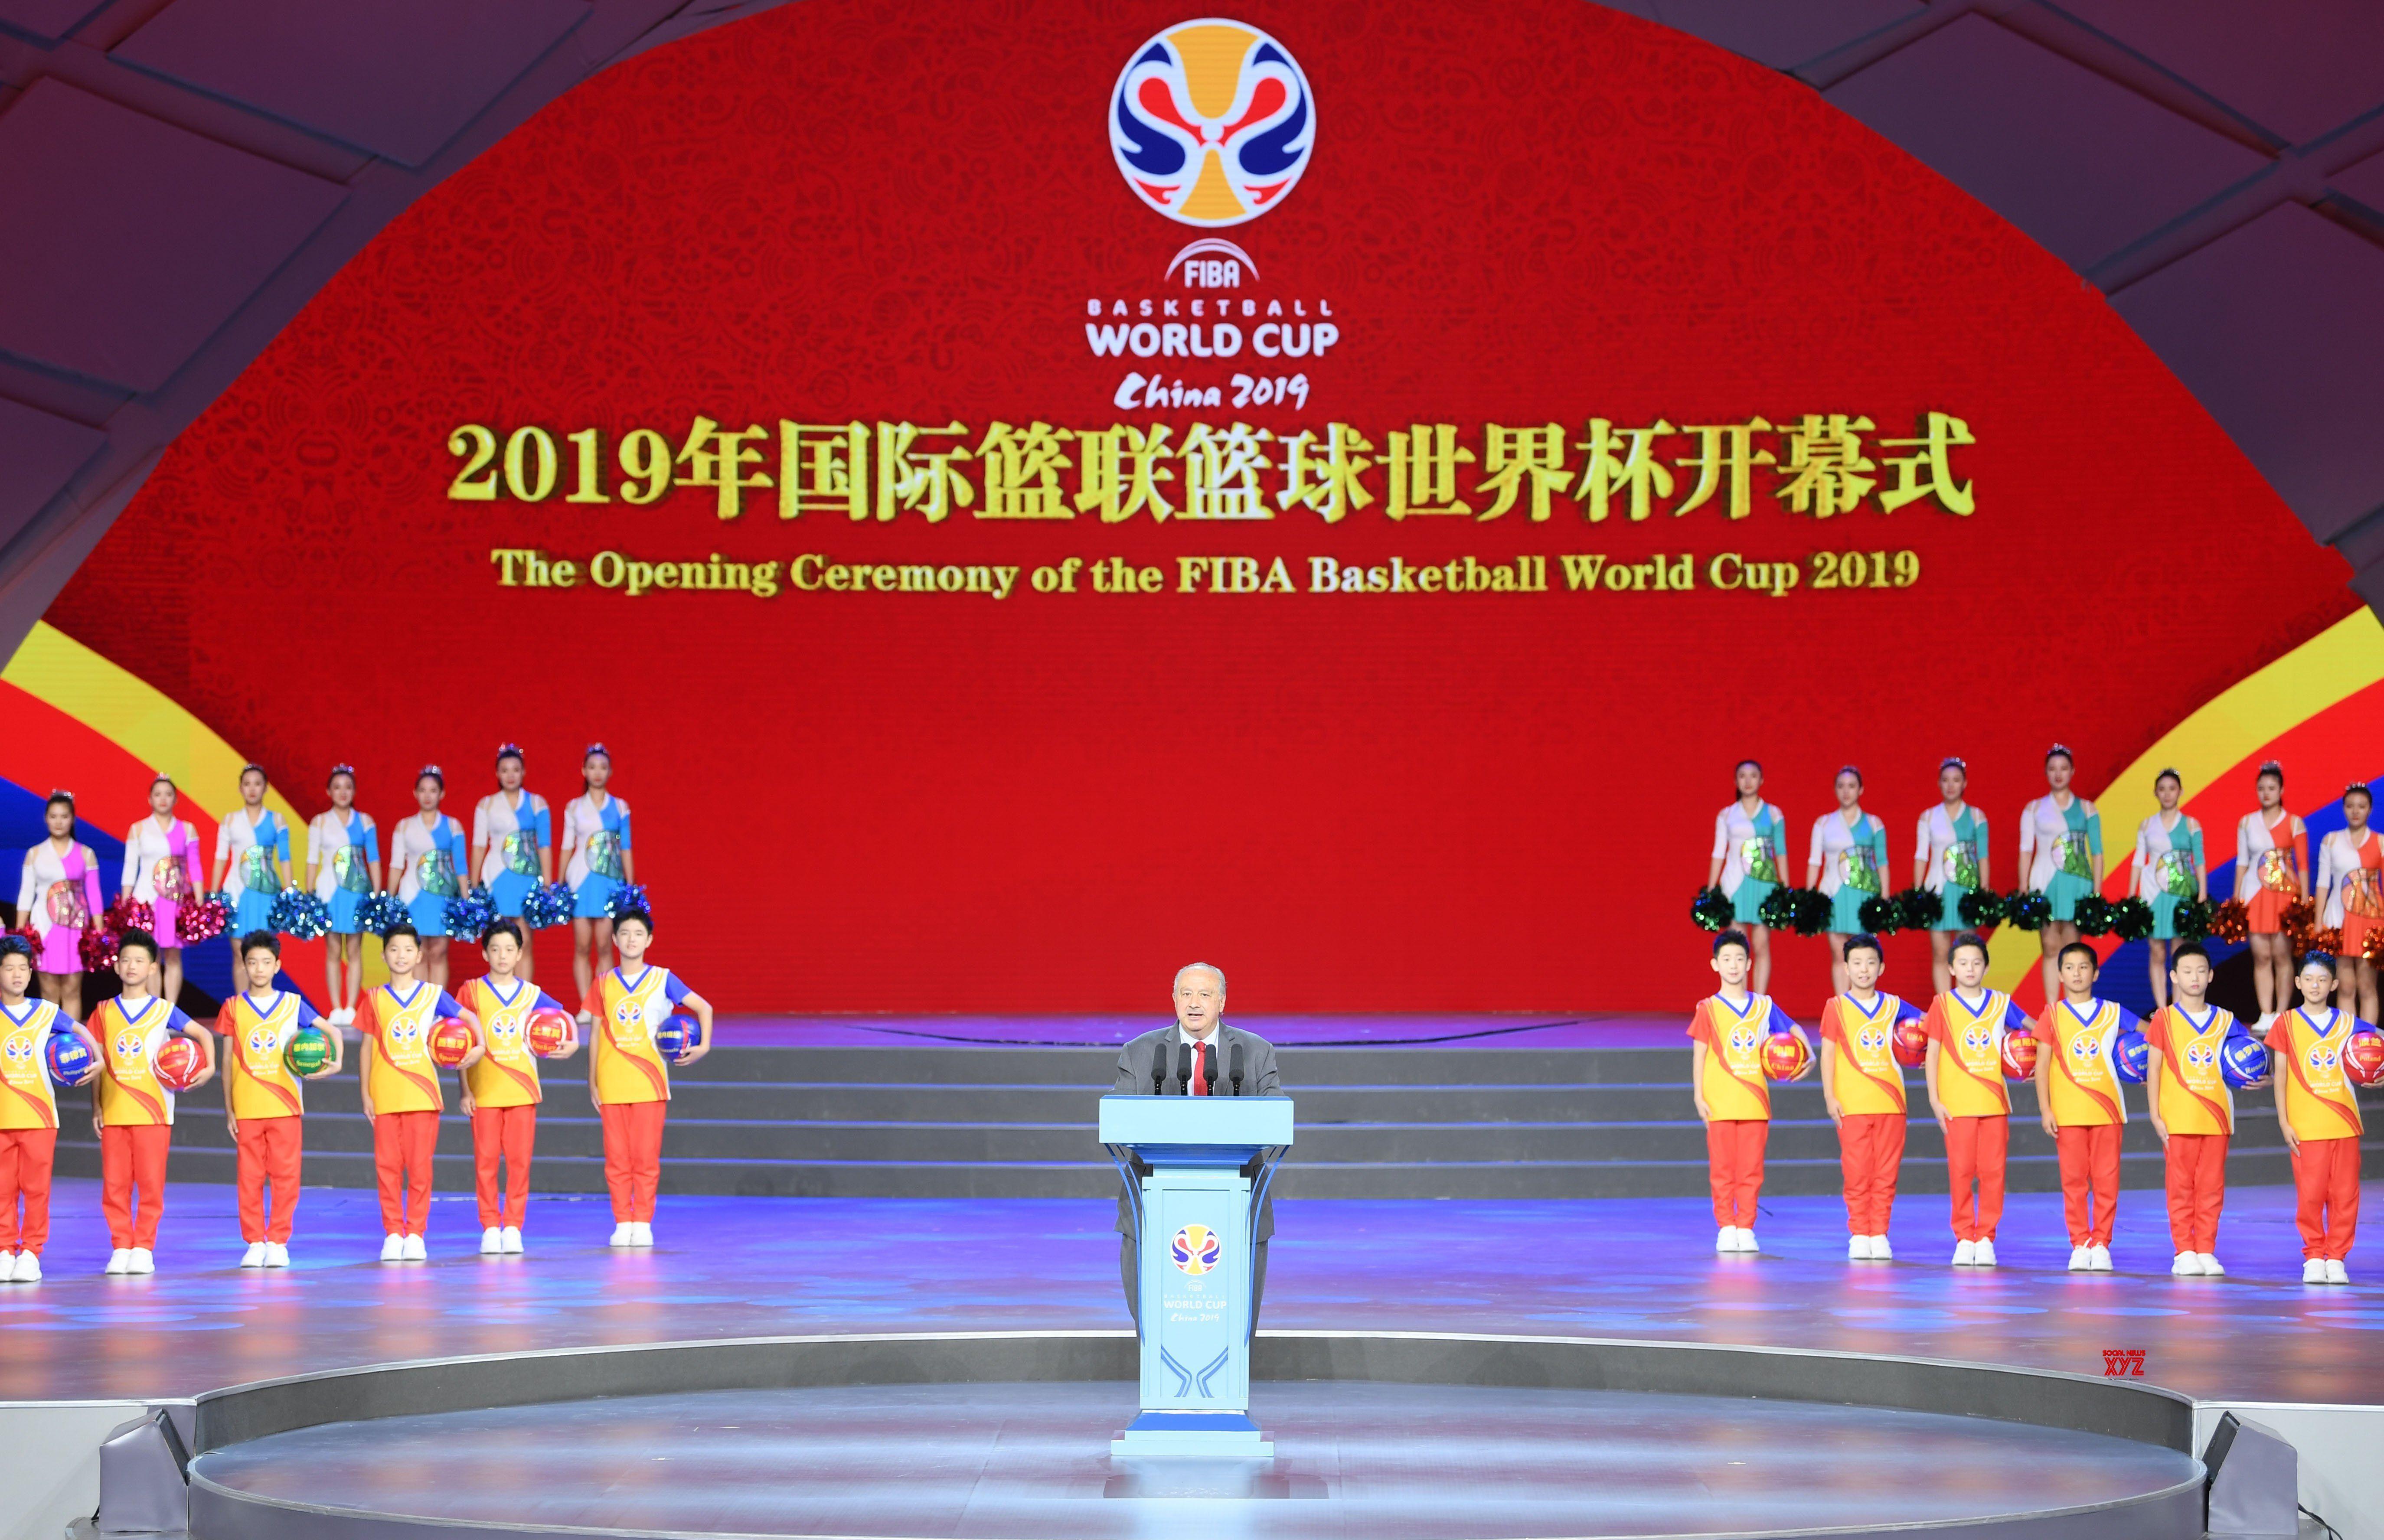 China Beijing Fiba Basketball World Cup Opening Ceremony Gallery Fiba Basketball Basketball World Cup